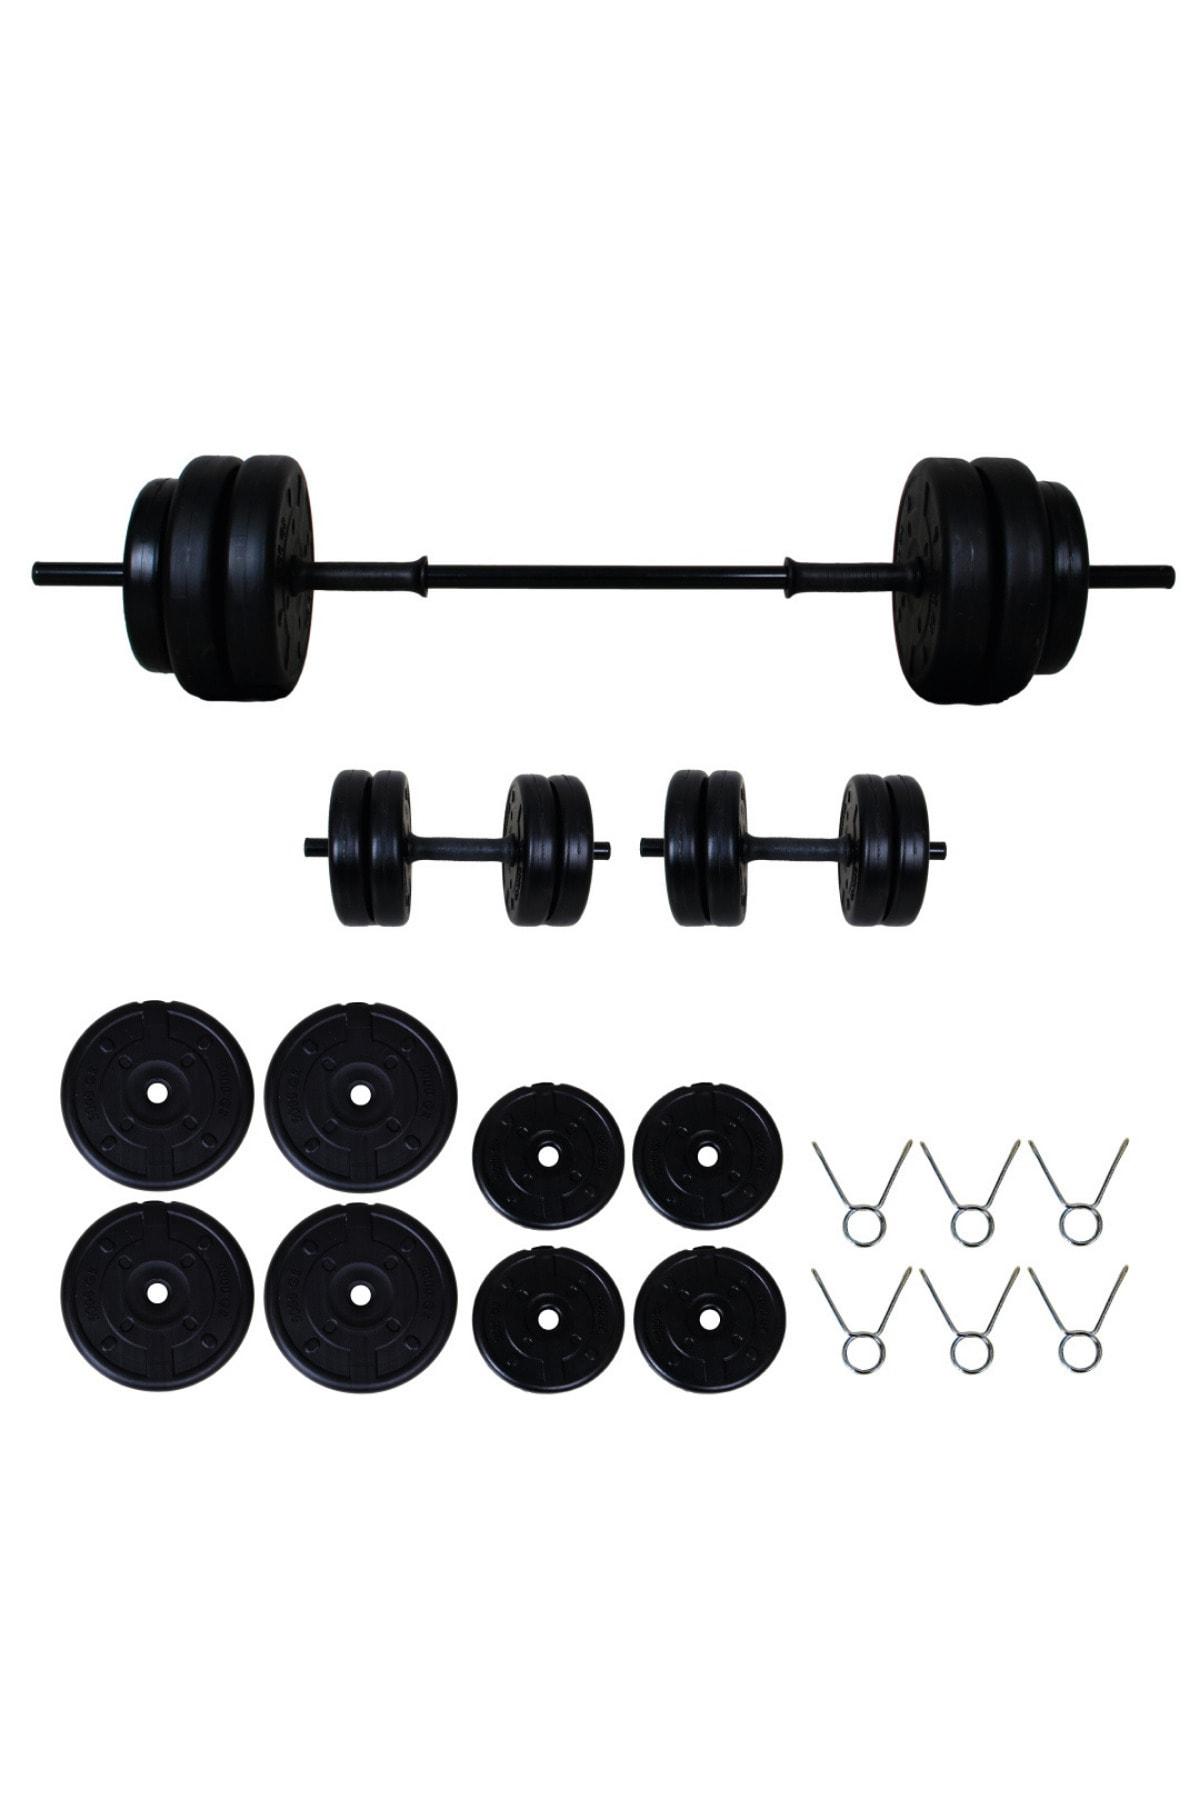 35 kg Halter Seti Dambıl Seti ve Fitness Spor Seti